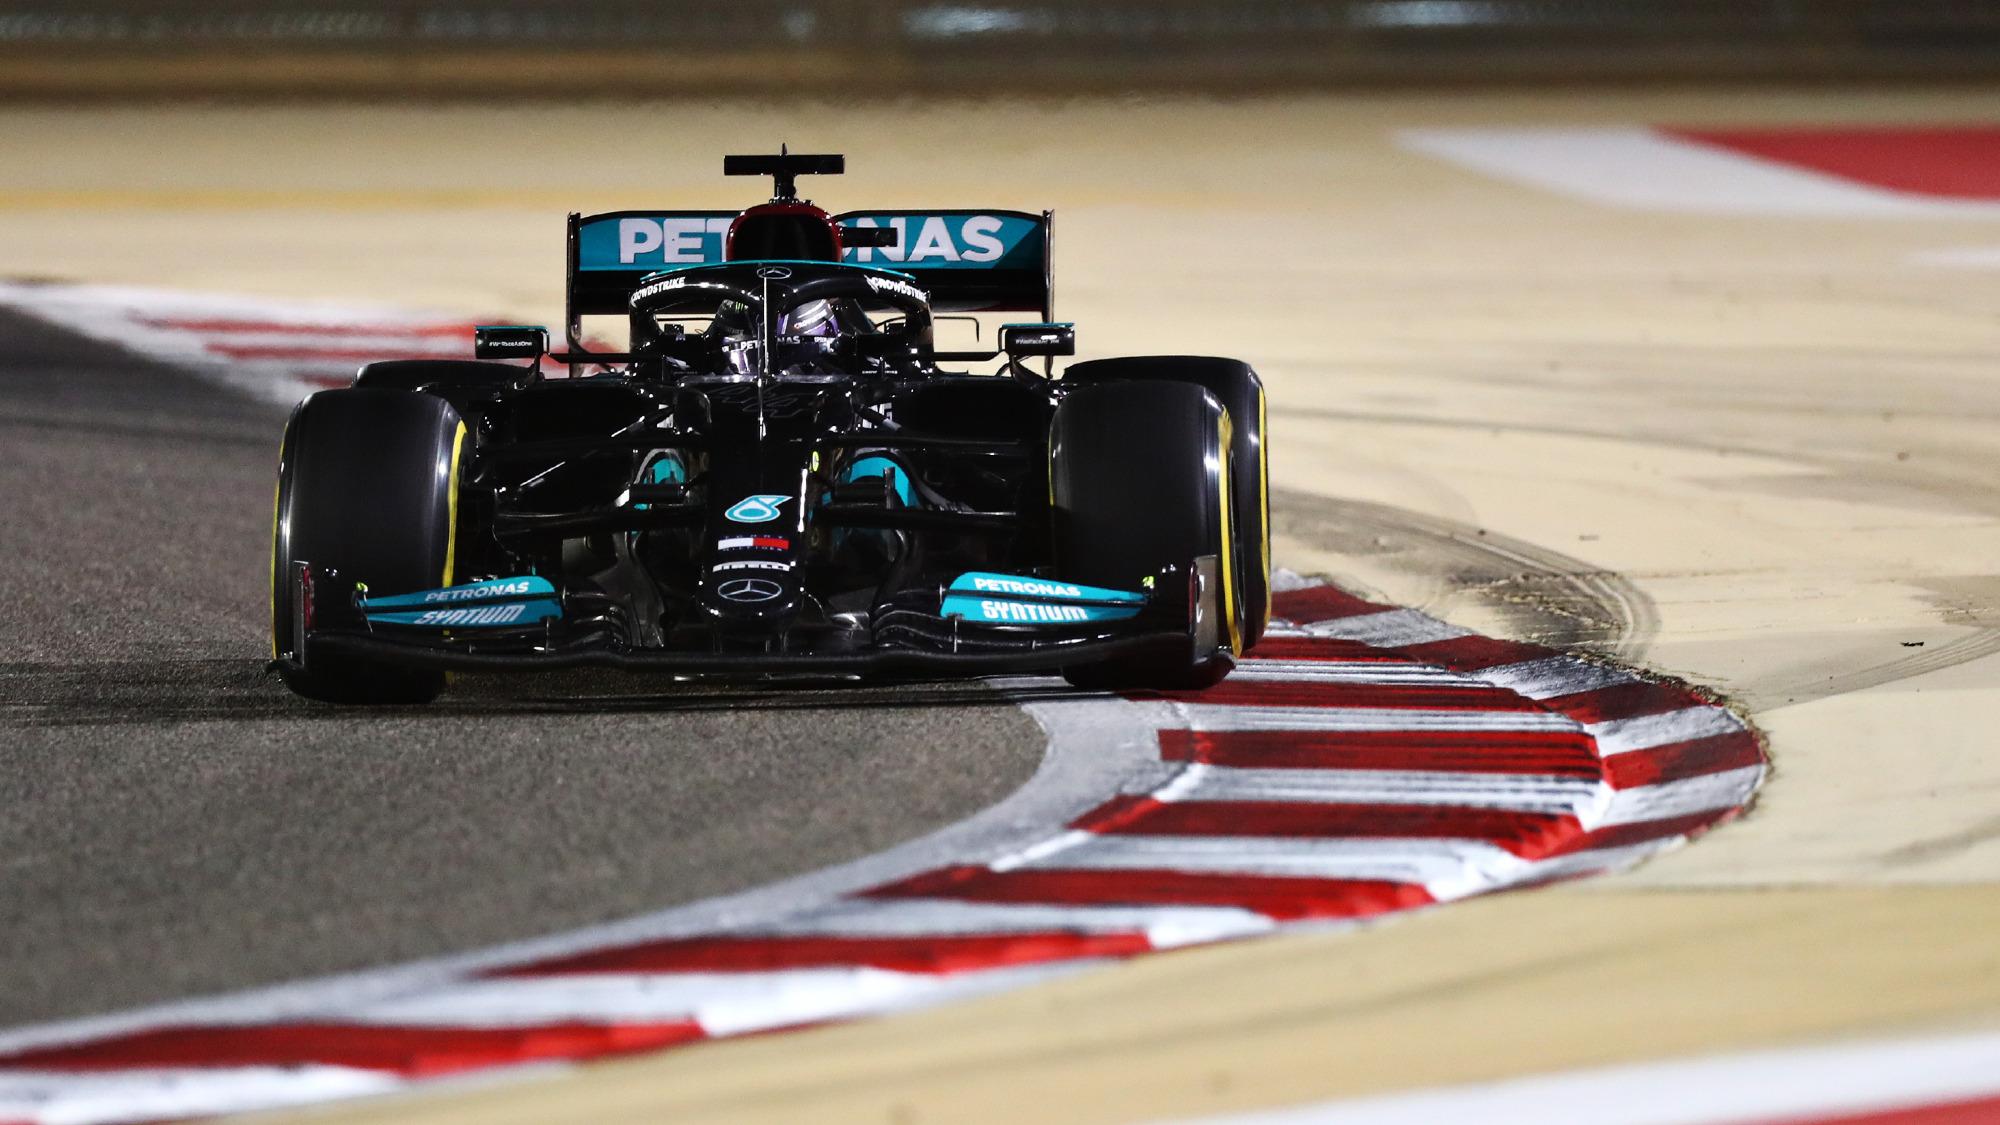 Lewis Hamilton, 2021 Bahrain Grand Prix